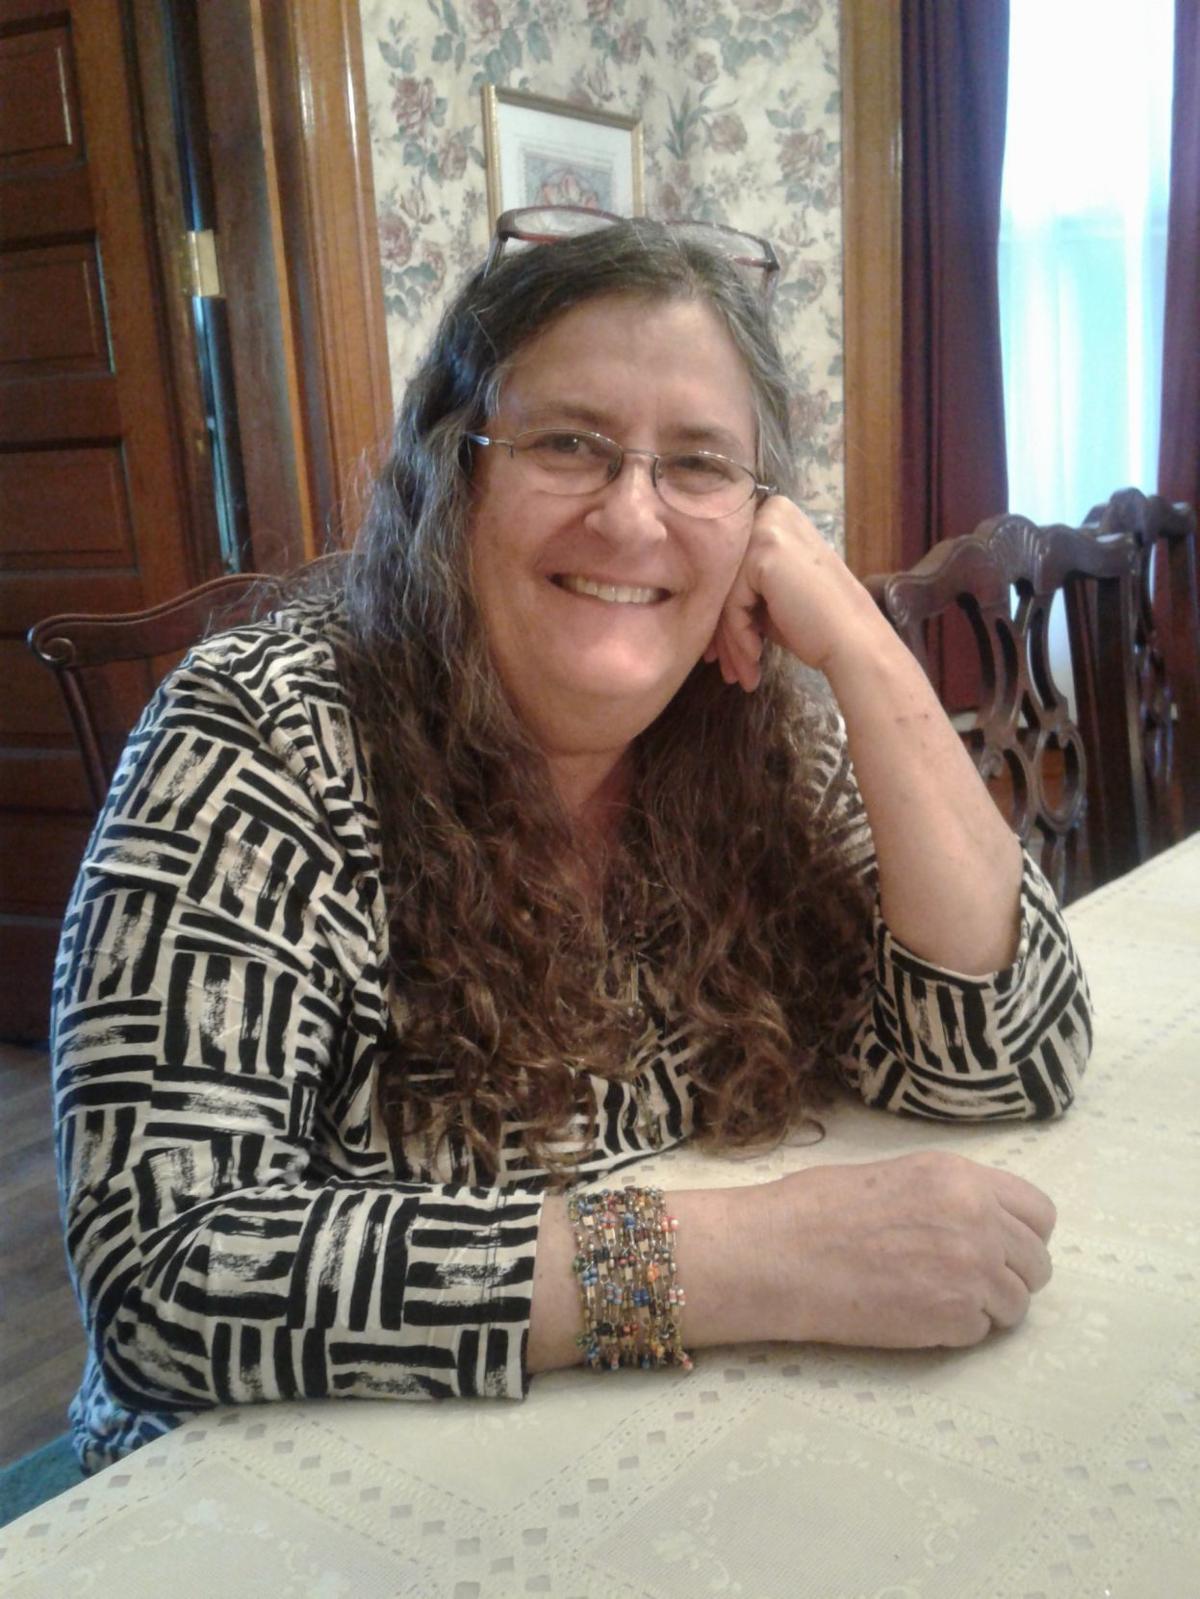 Jane Ellen Ibur, St. Louis poet laureate, at her home